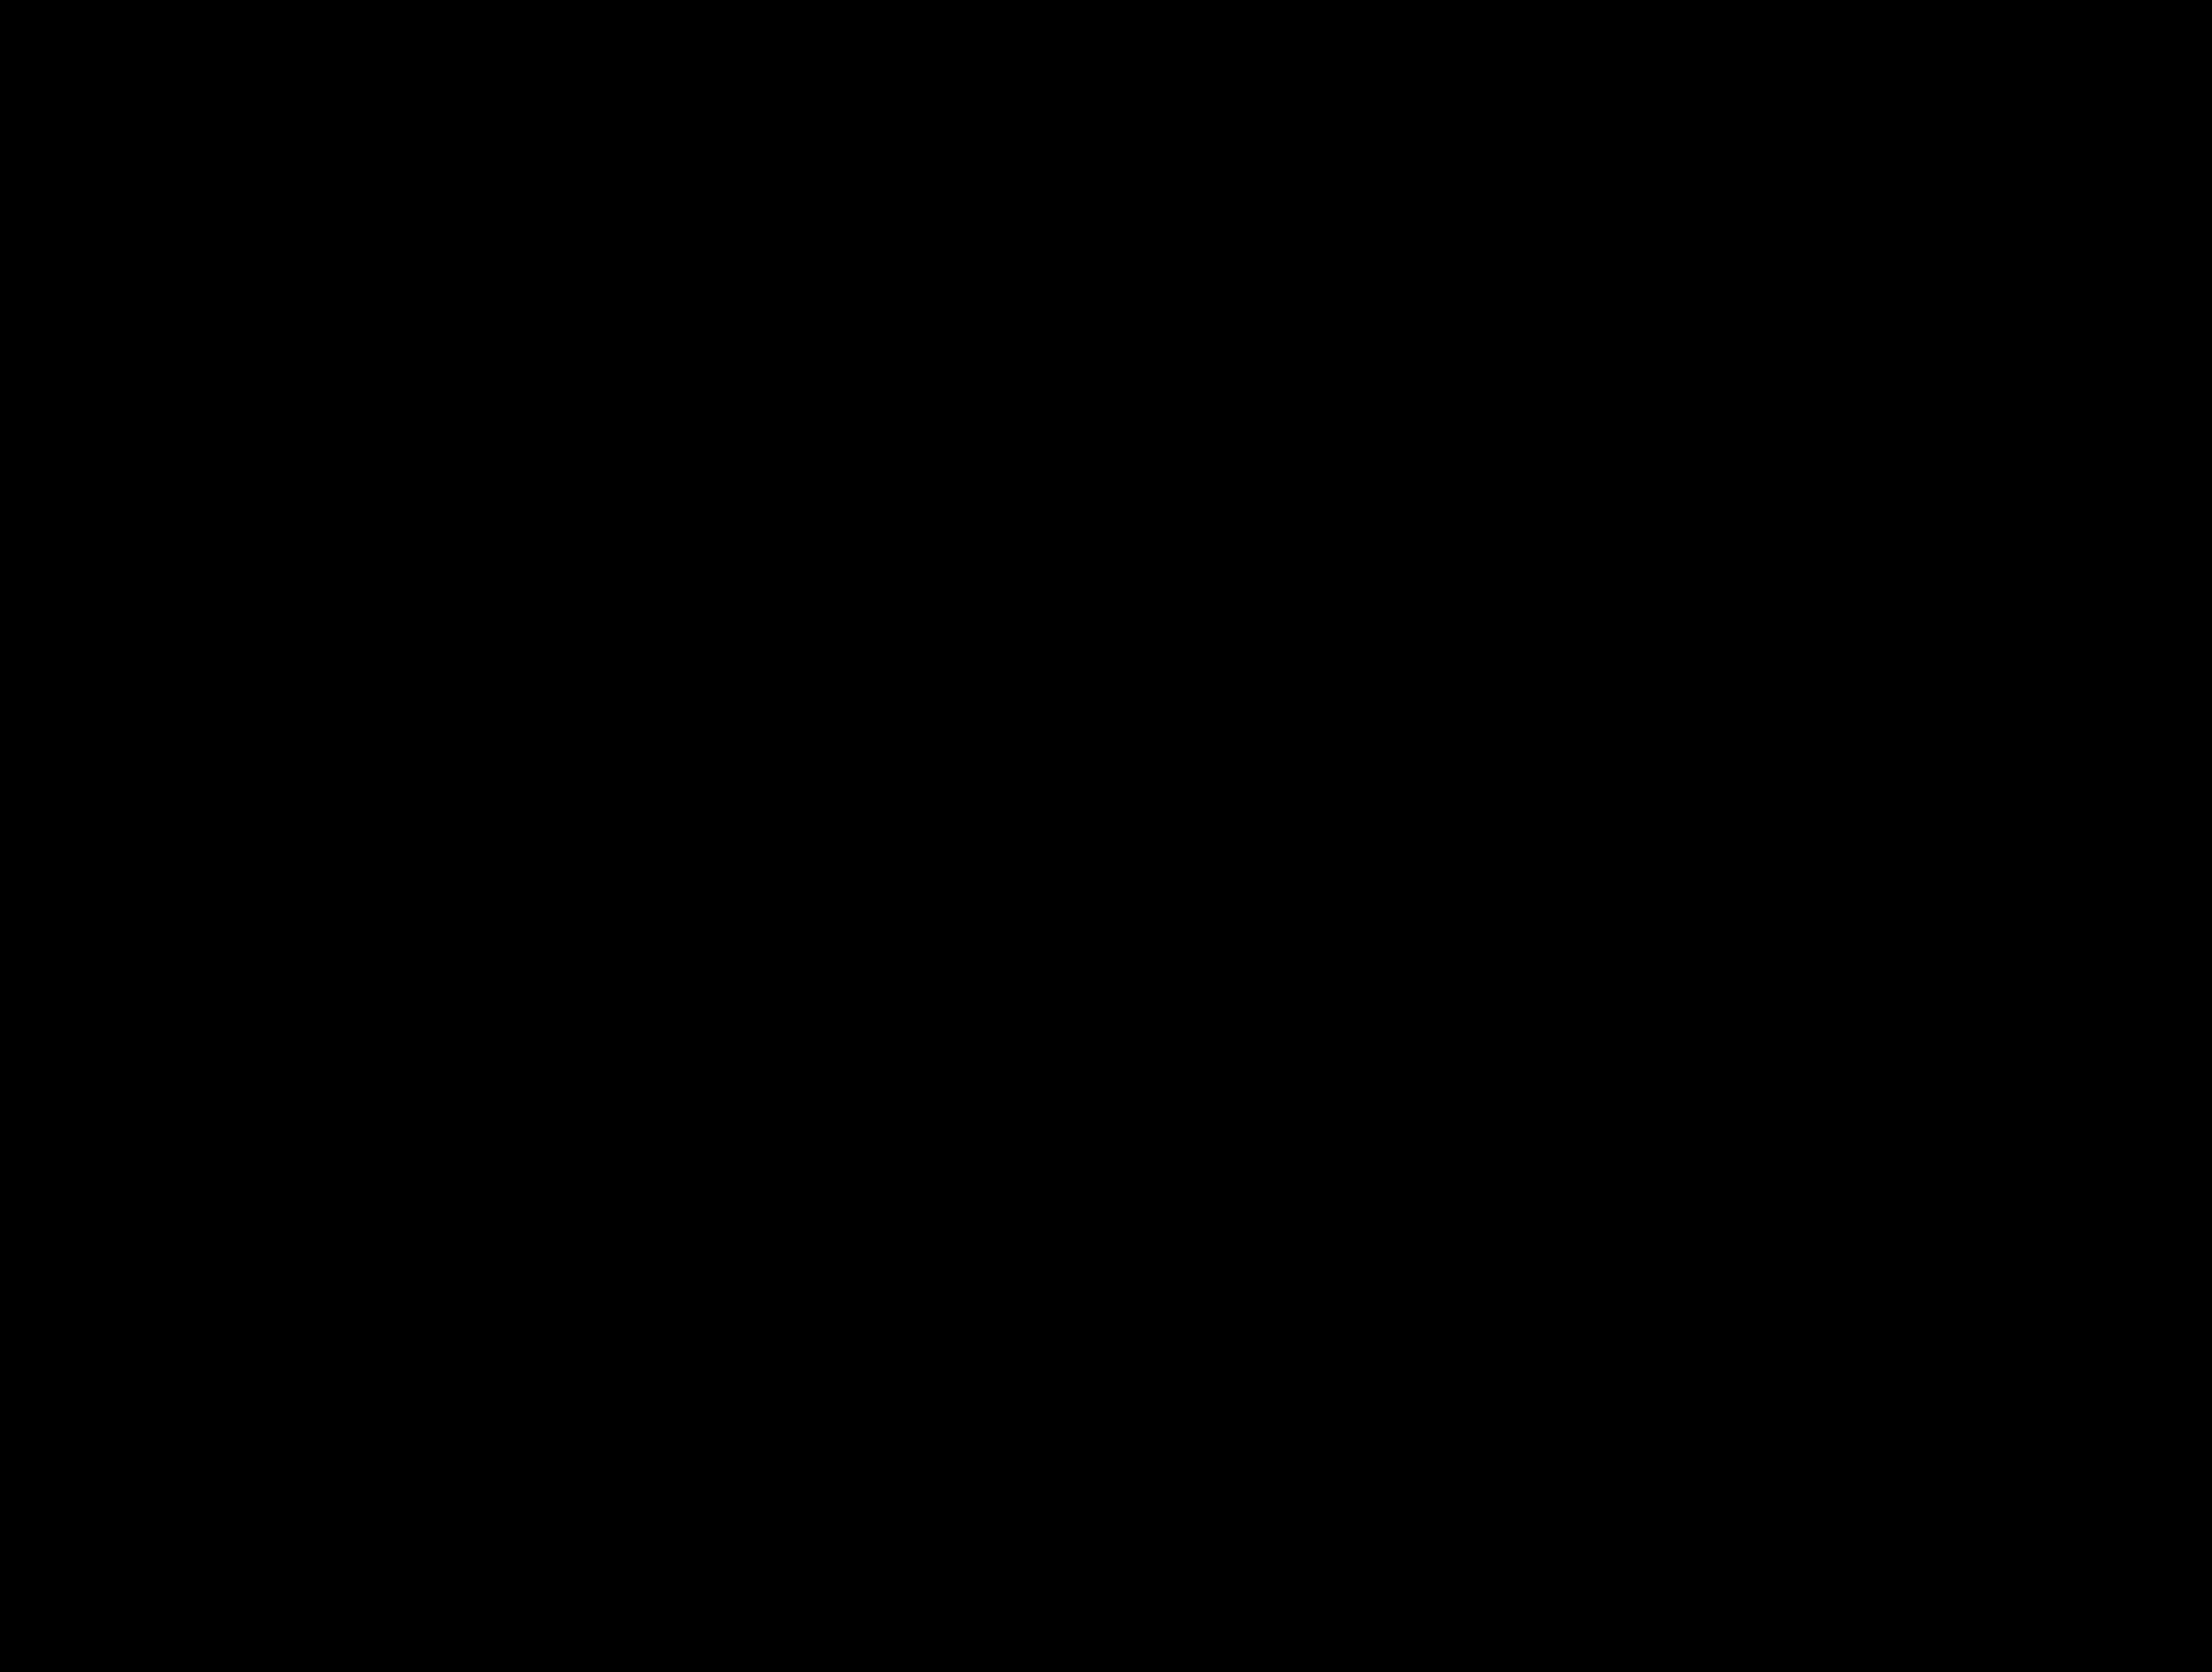 03 - Golem - Defense.png